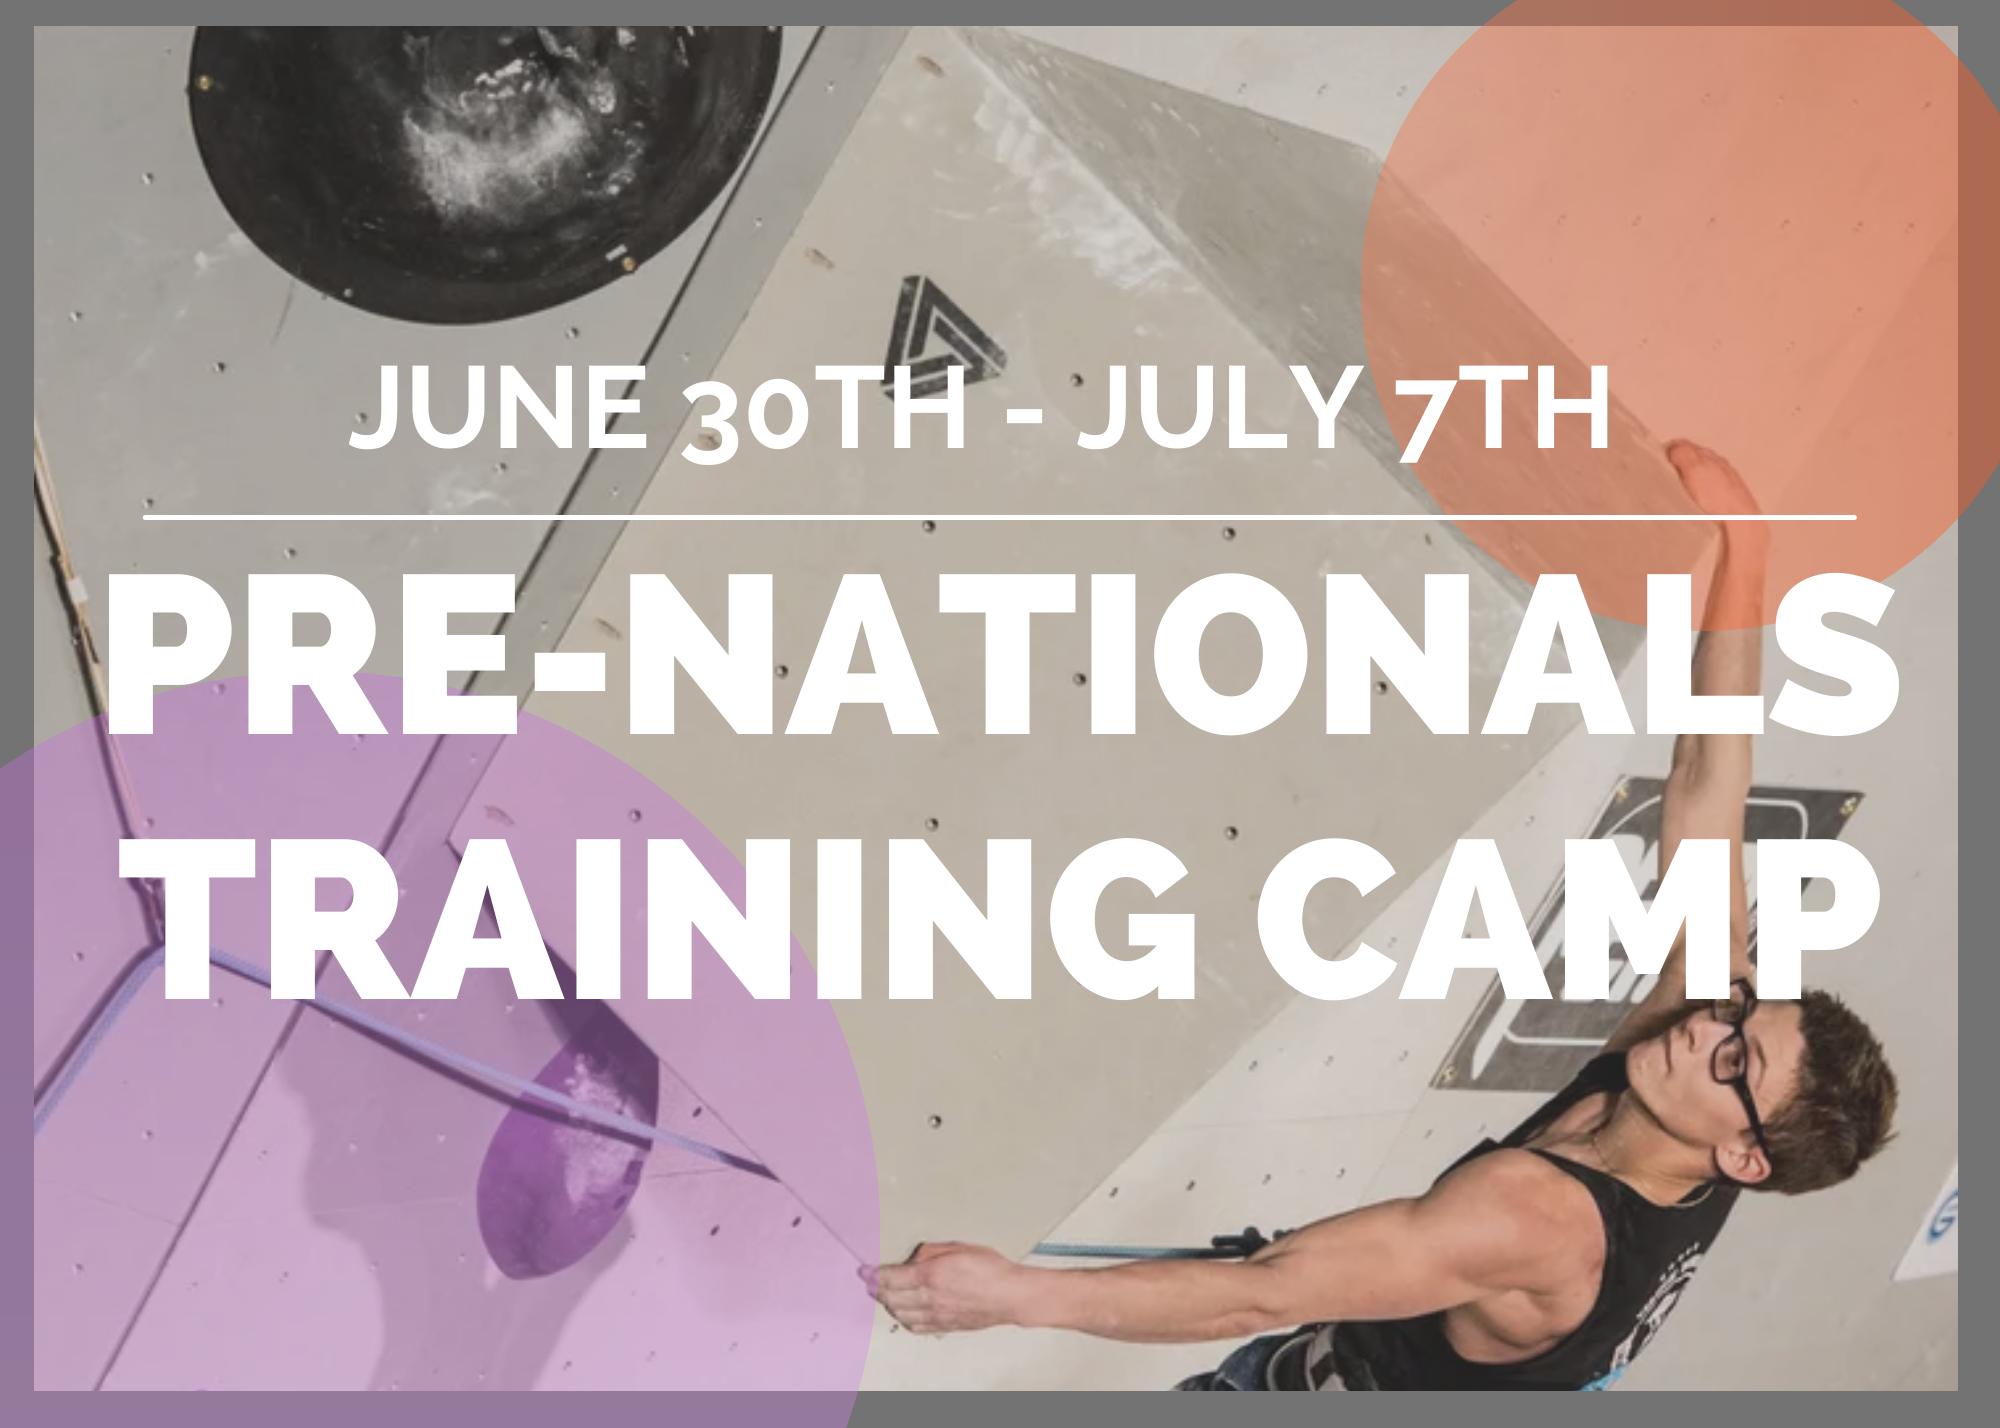 Pre Nationals Training Camp